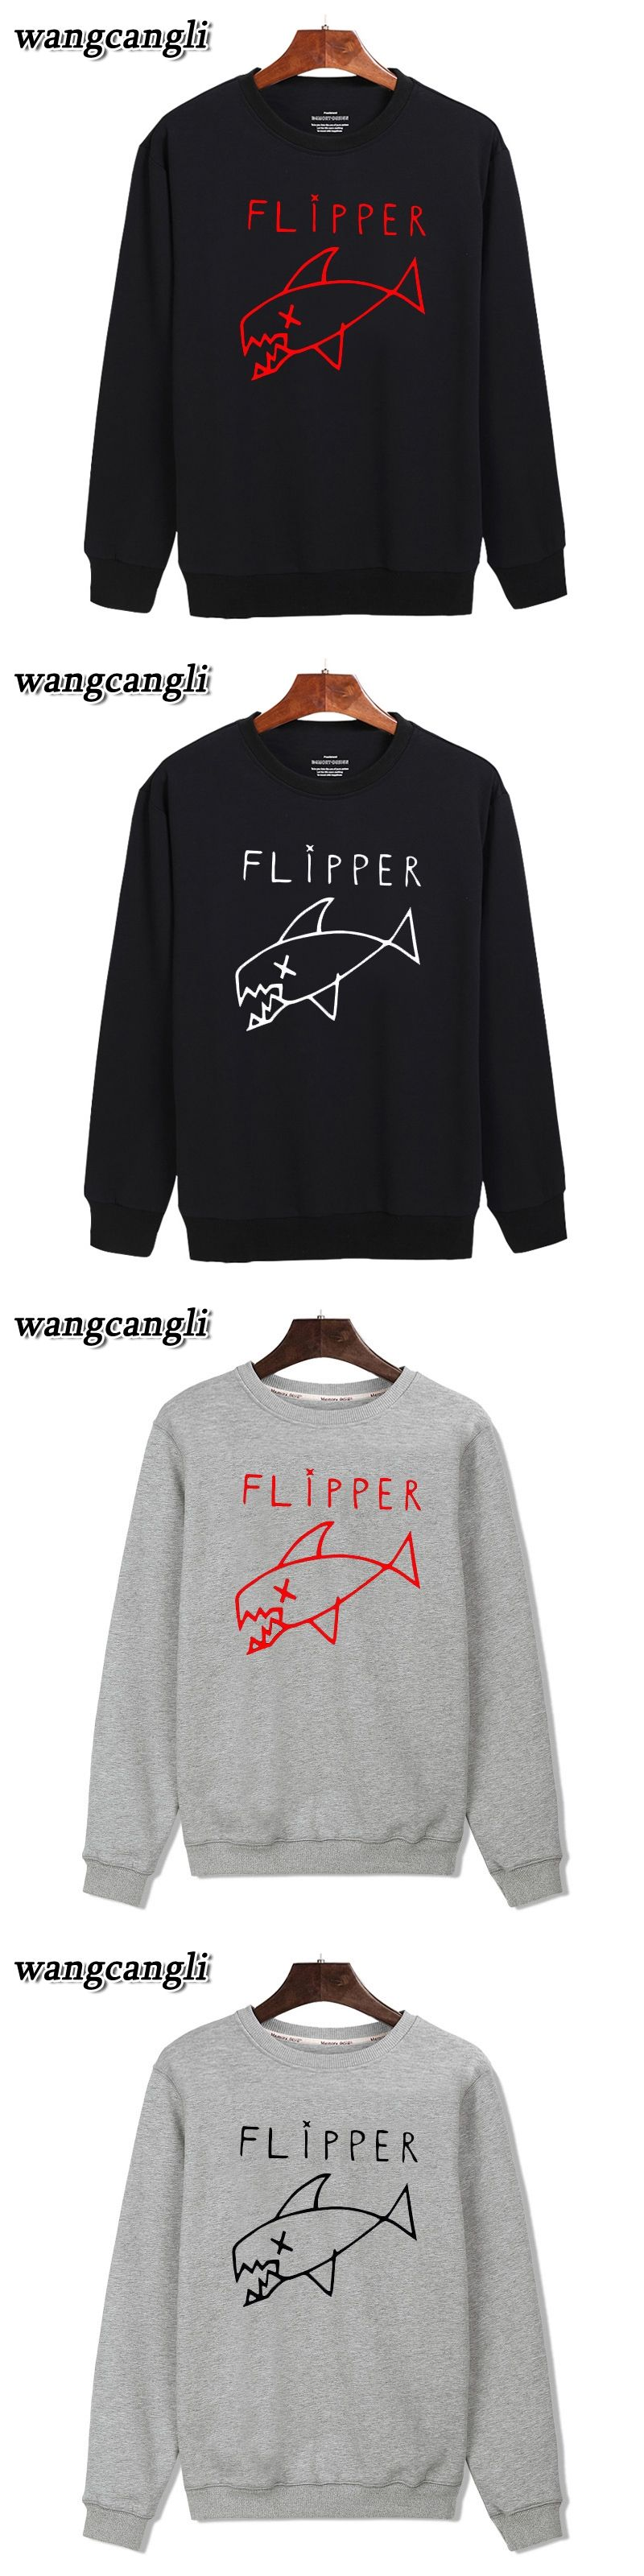 a7fb3d5be56 Cartoon Flipper Fish purpose tour hoodie Black hoodies men brand designer  mens sweatshirt men in 3XL